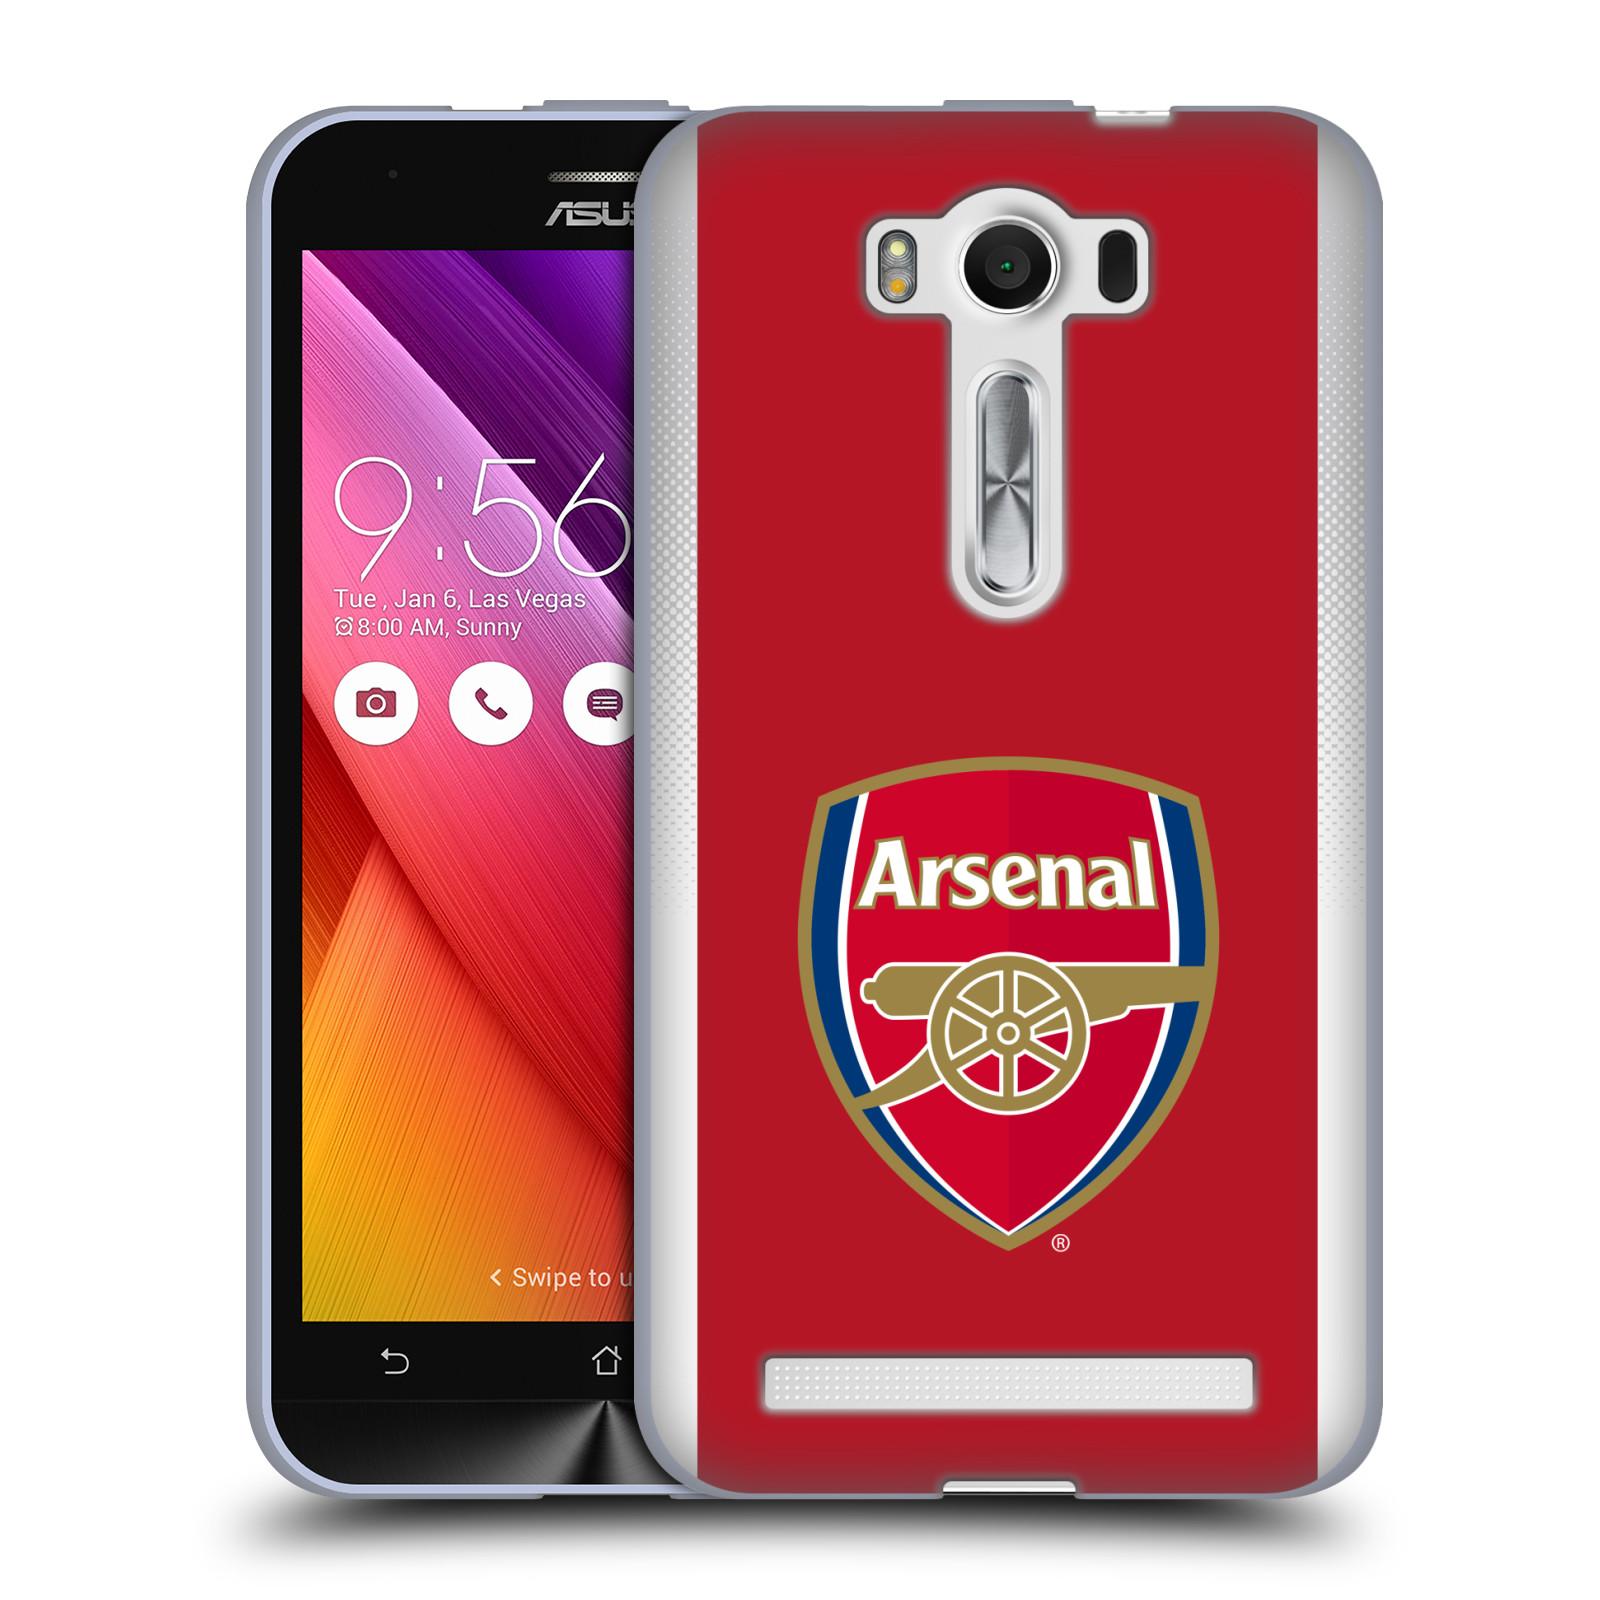 Silikonové pouzdro na mobil Asus ZenFone 2 Laser ZE500KL - Head Case - Arsenal FC - Logo klubu